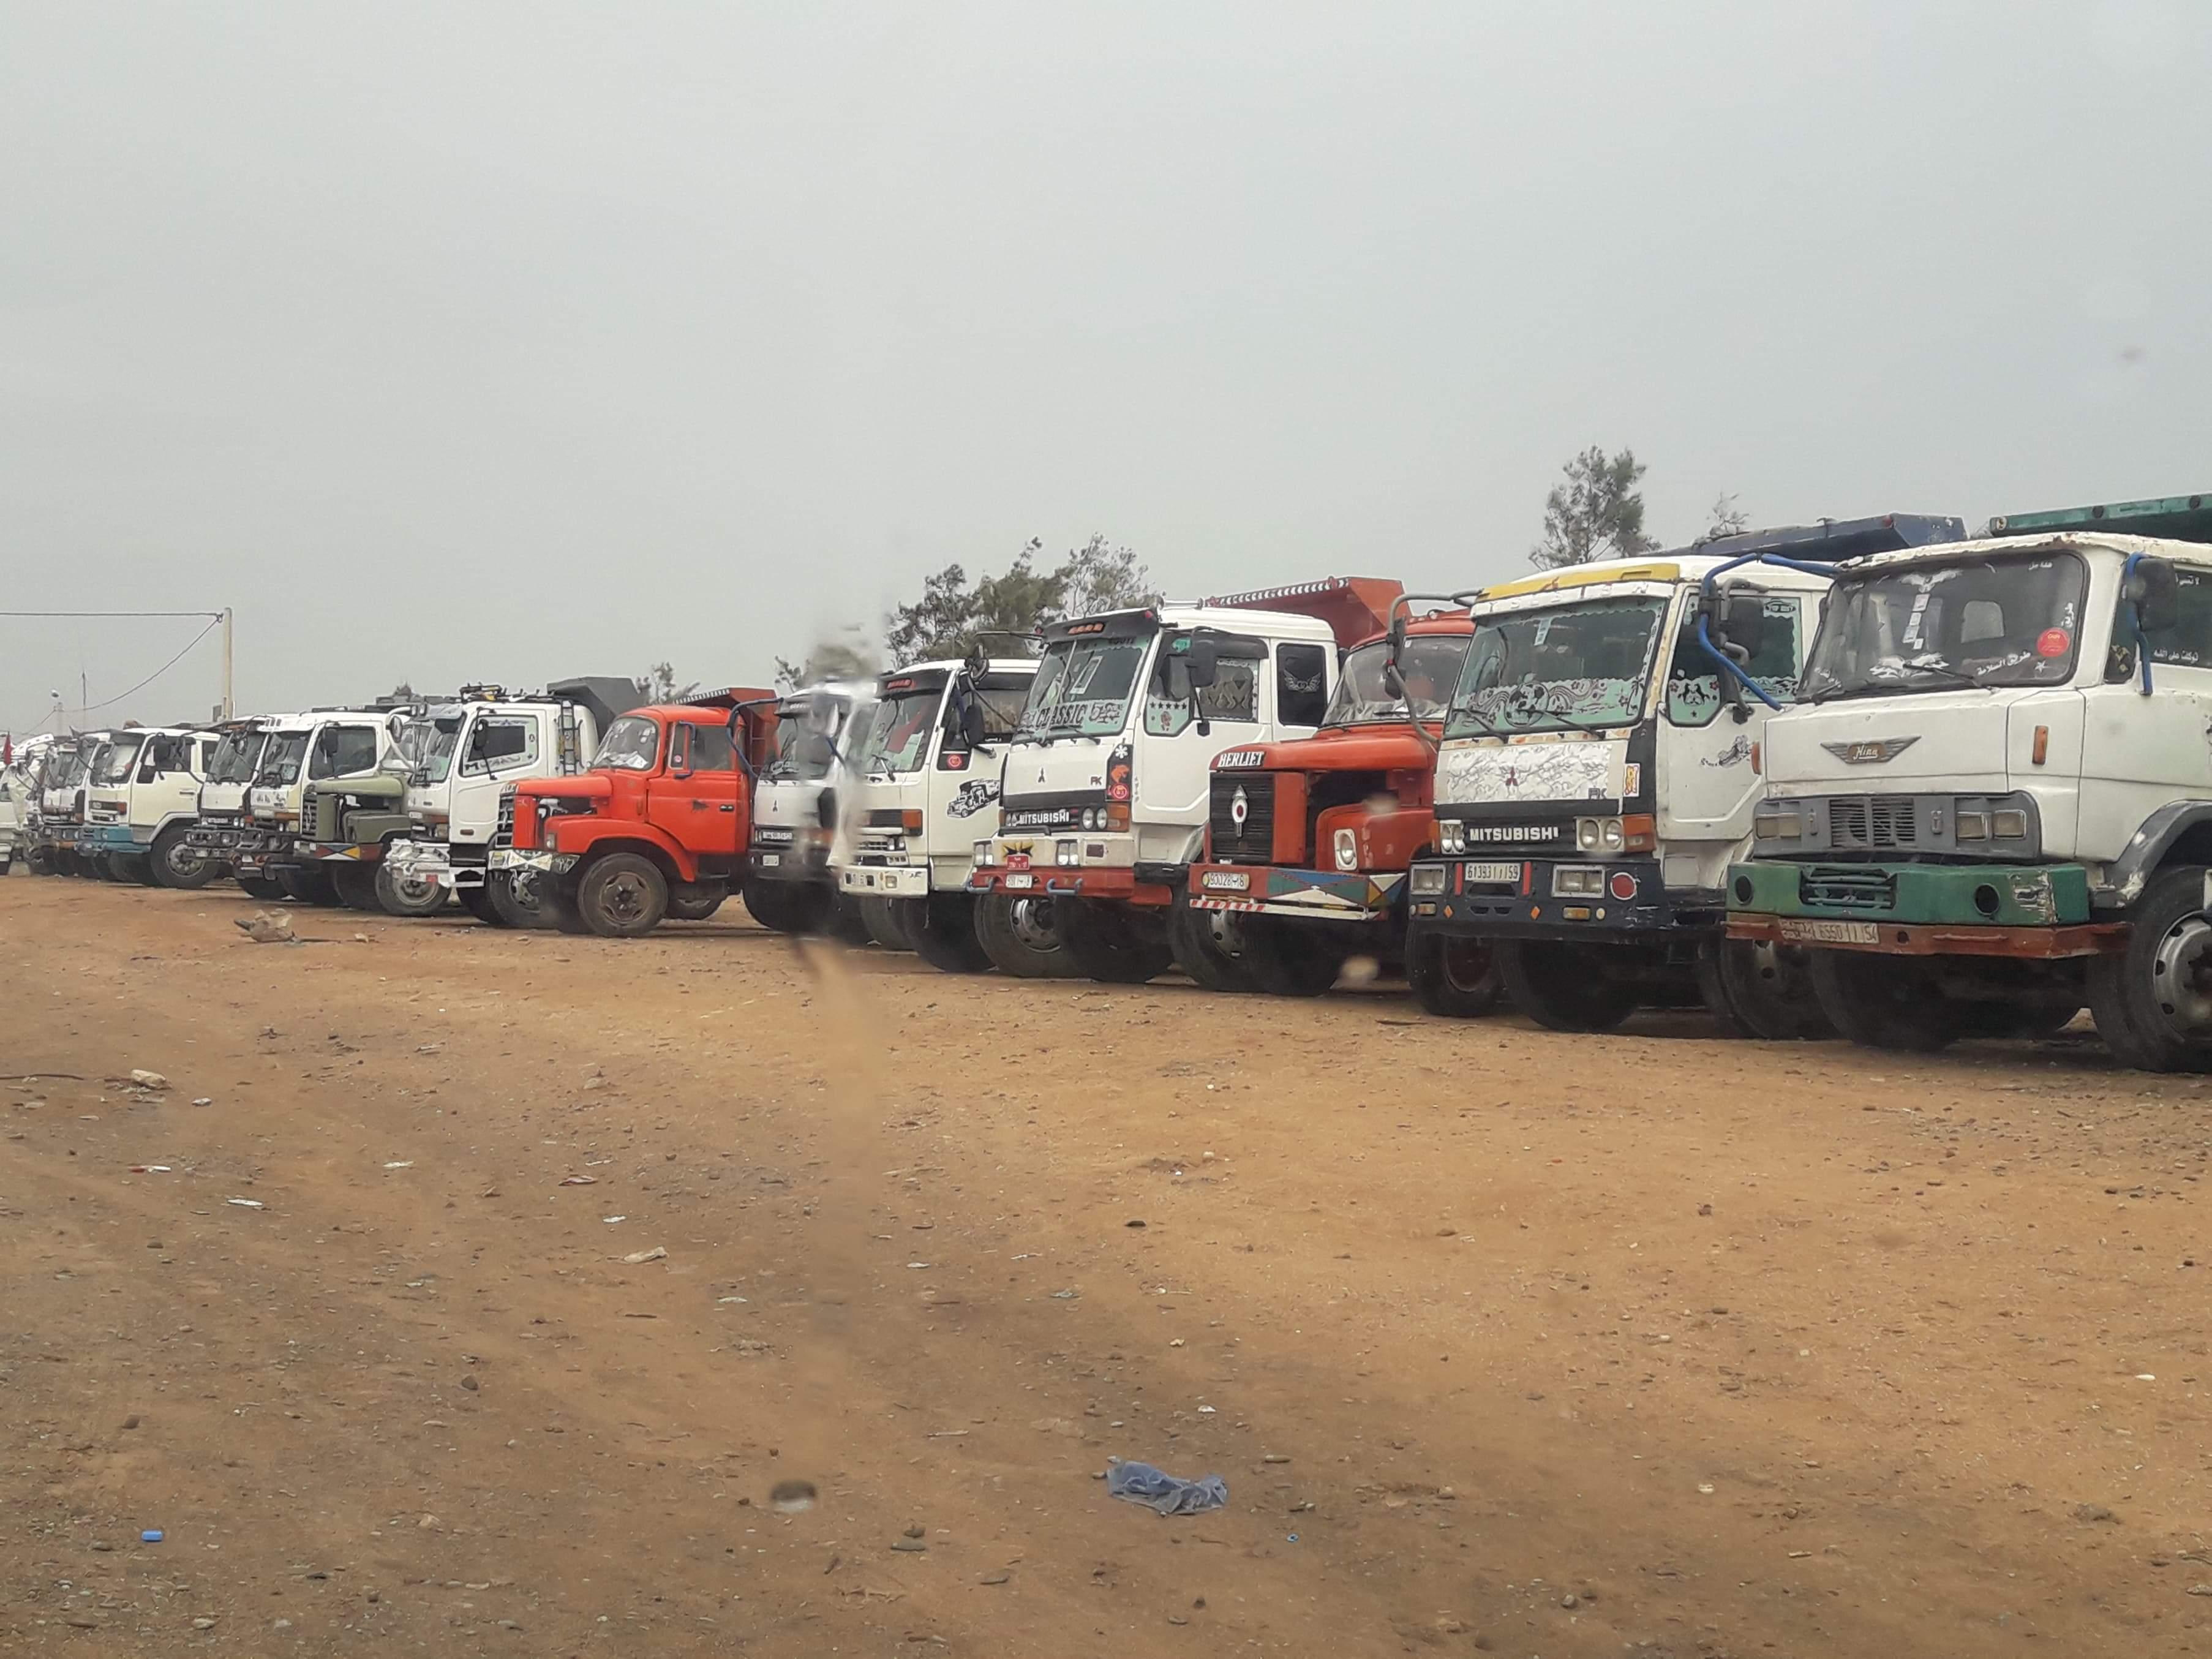 اشتوكن و إنزكان : CDT و ODT تدعوان إلى إضراب مفتوح لسائقي الشاحنات